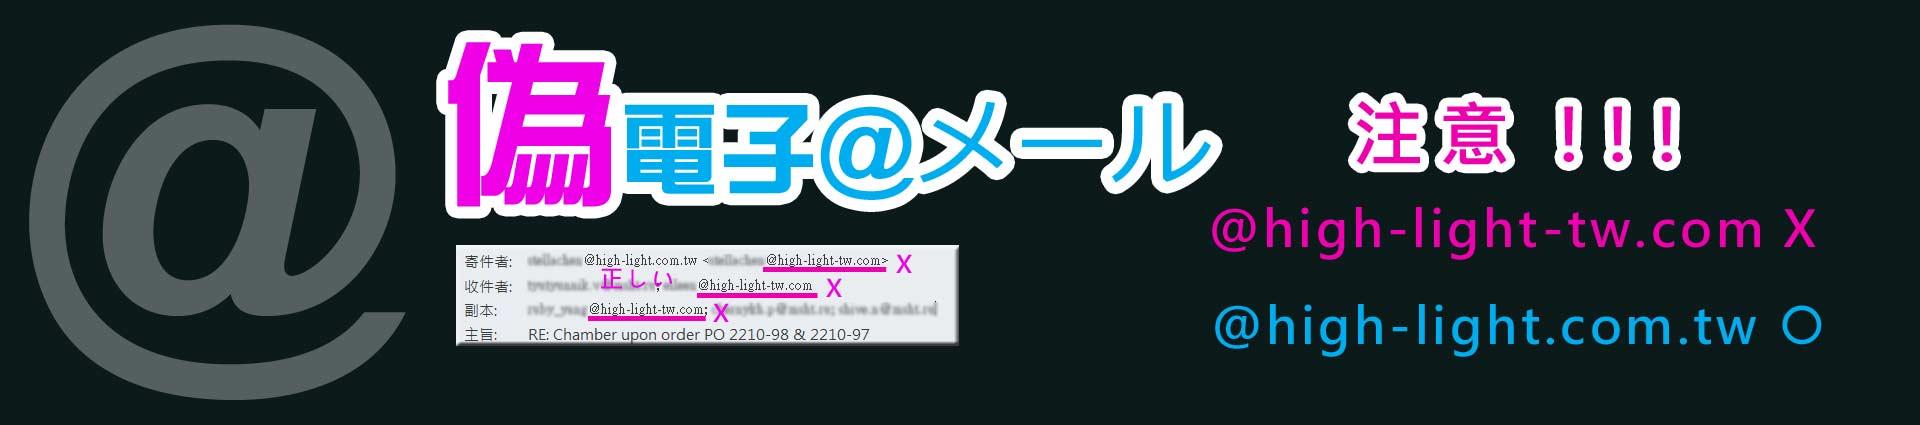 htc-vacuum-mail-jp.jpg